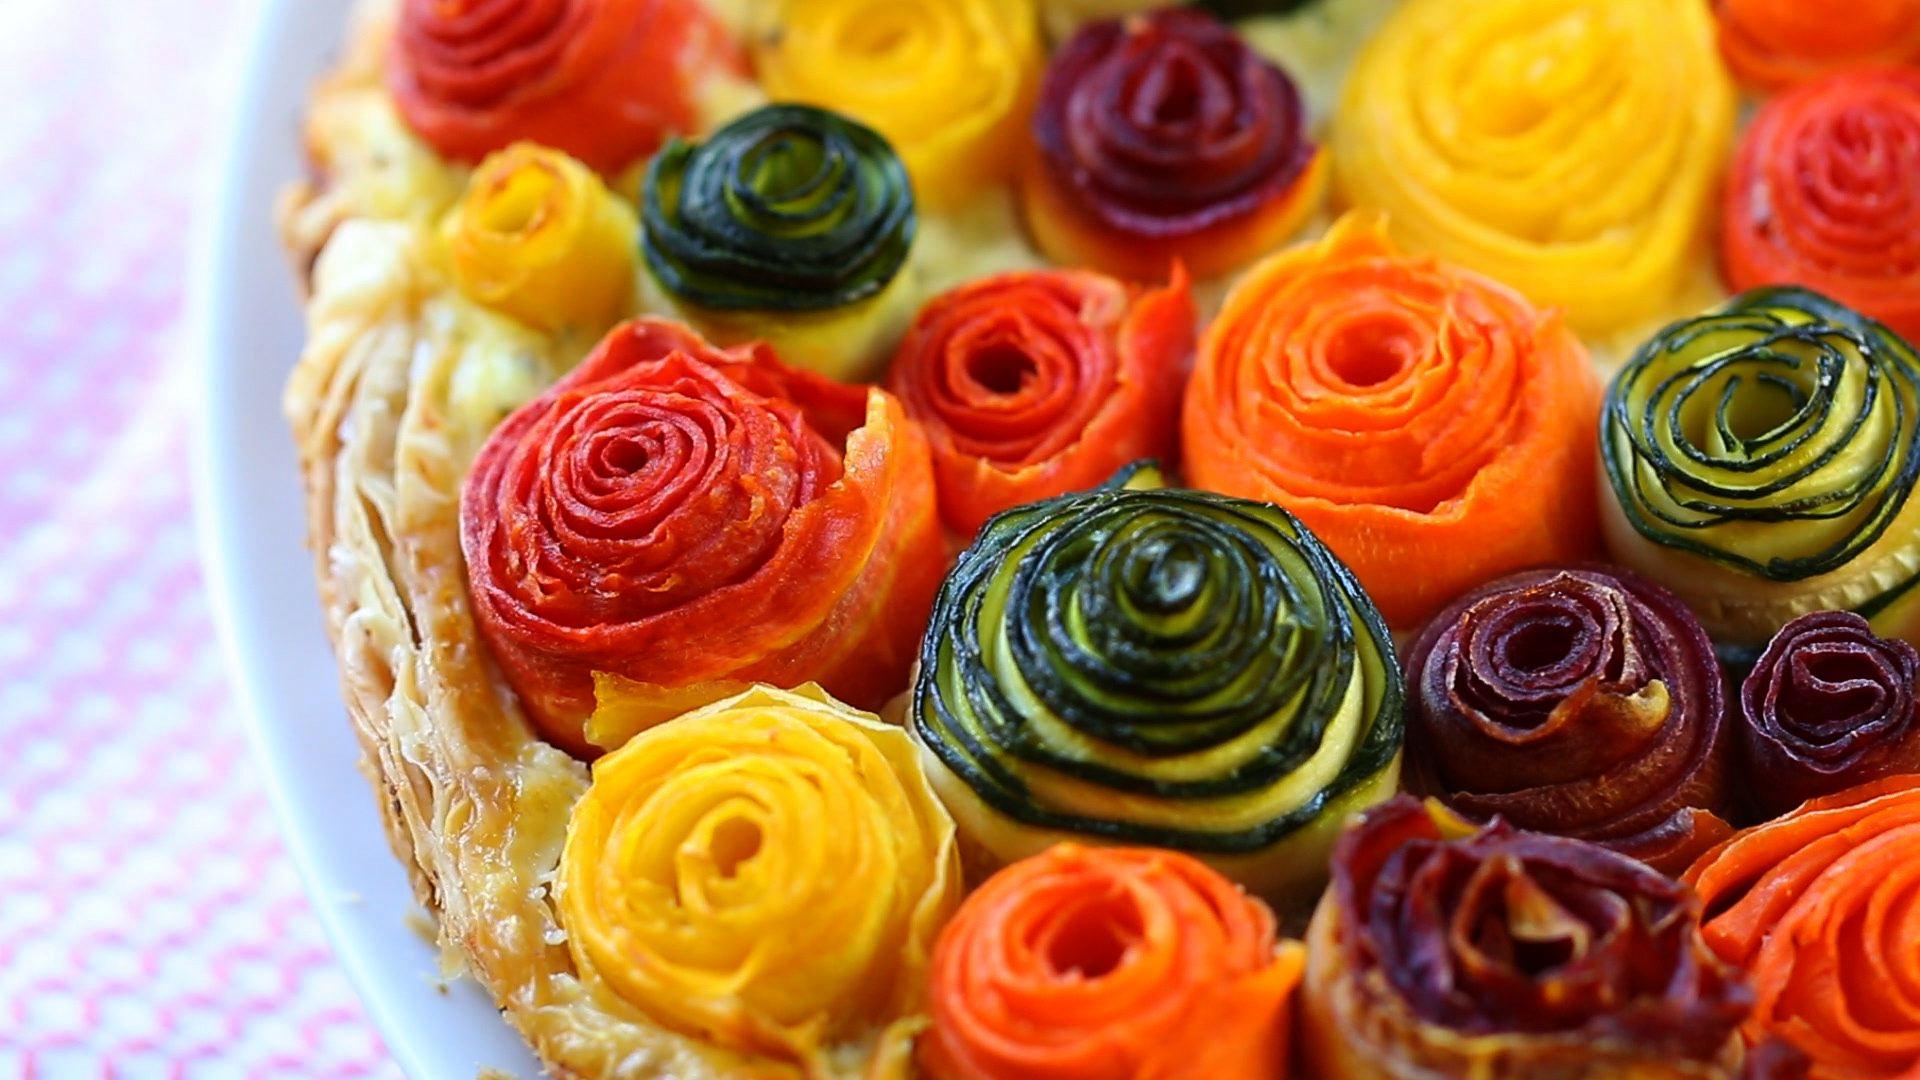 Zucchini and carrots roses tart | Buona Pappa